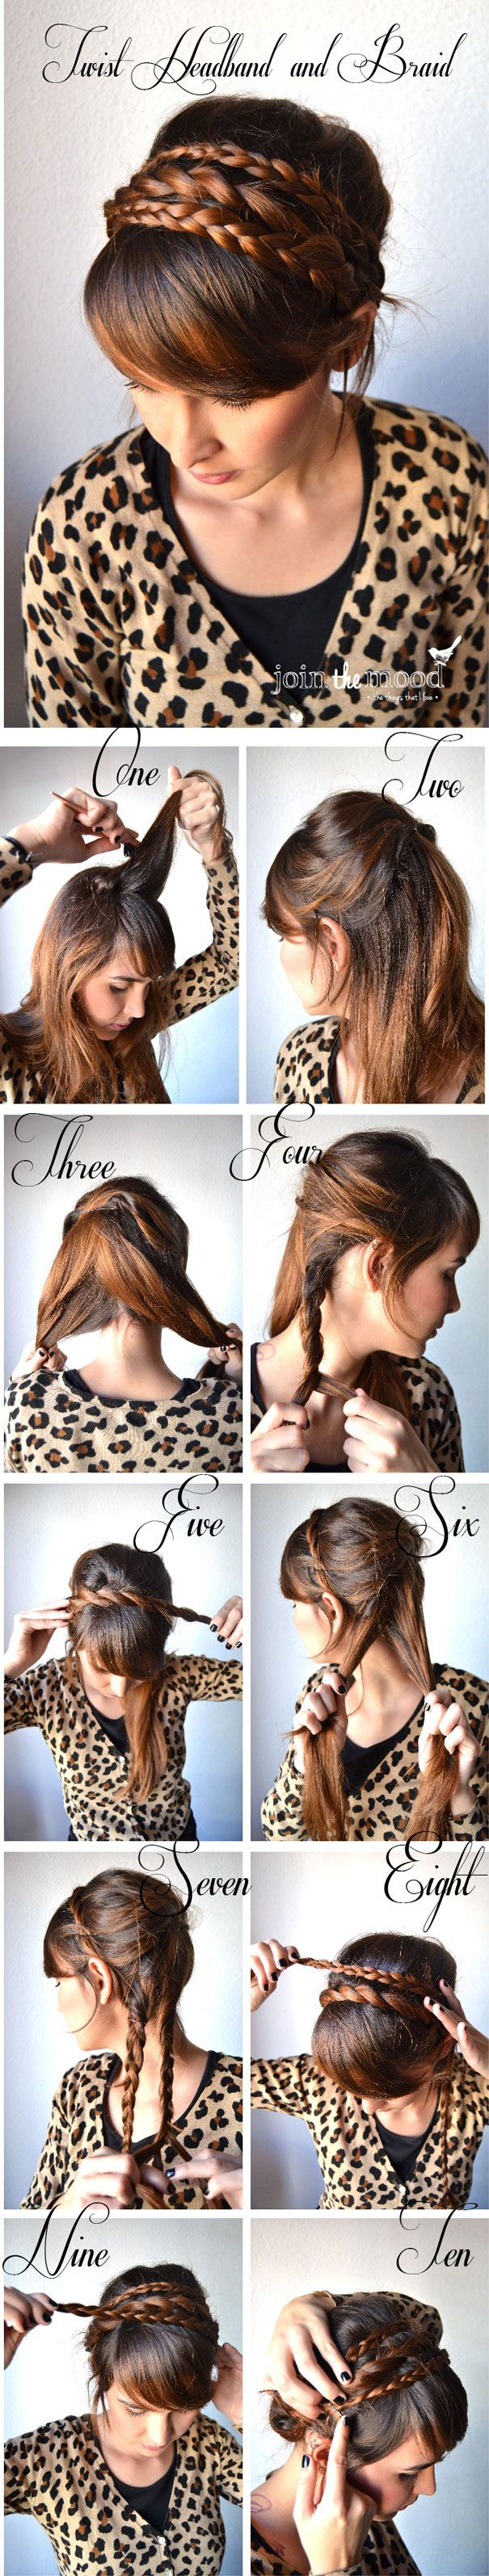 10 Step Braided Headband